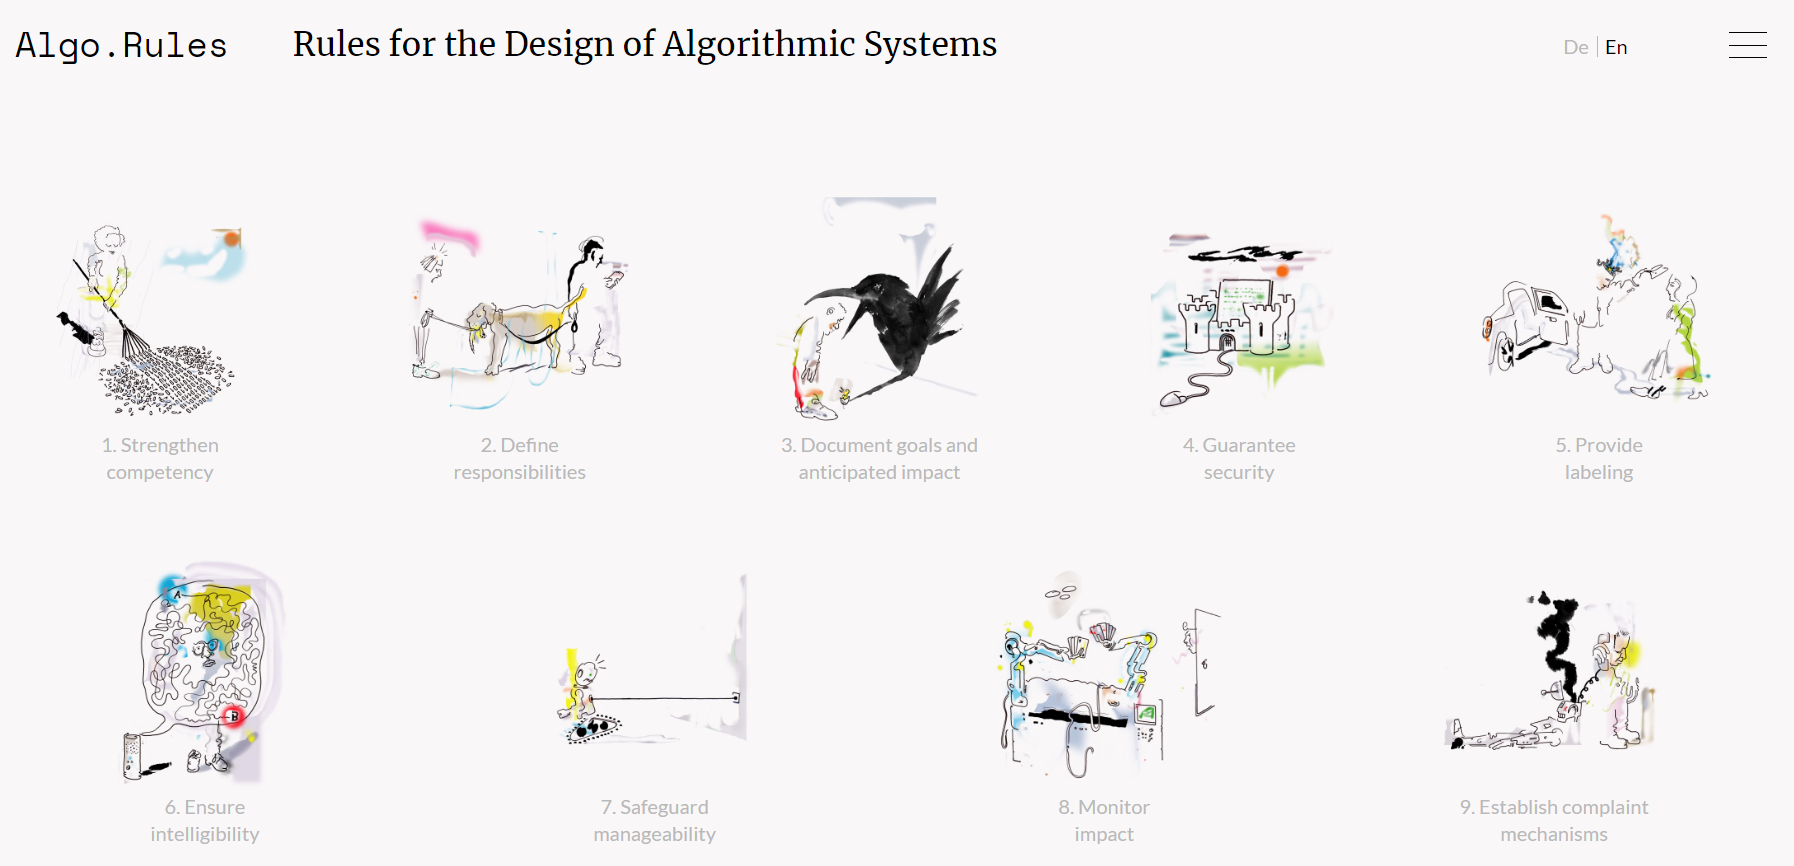 algorules